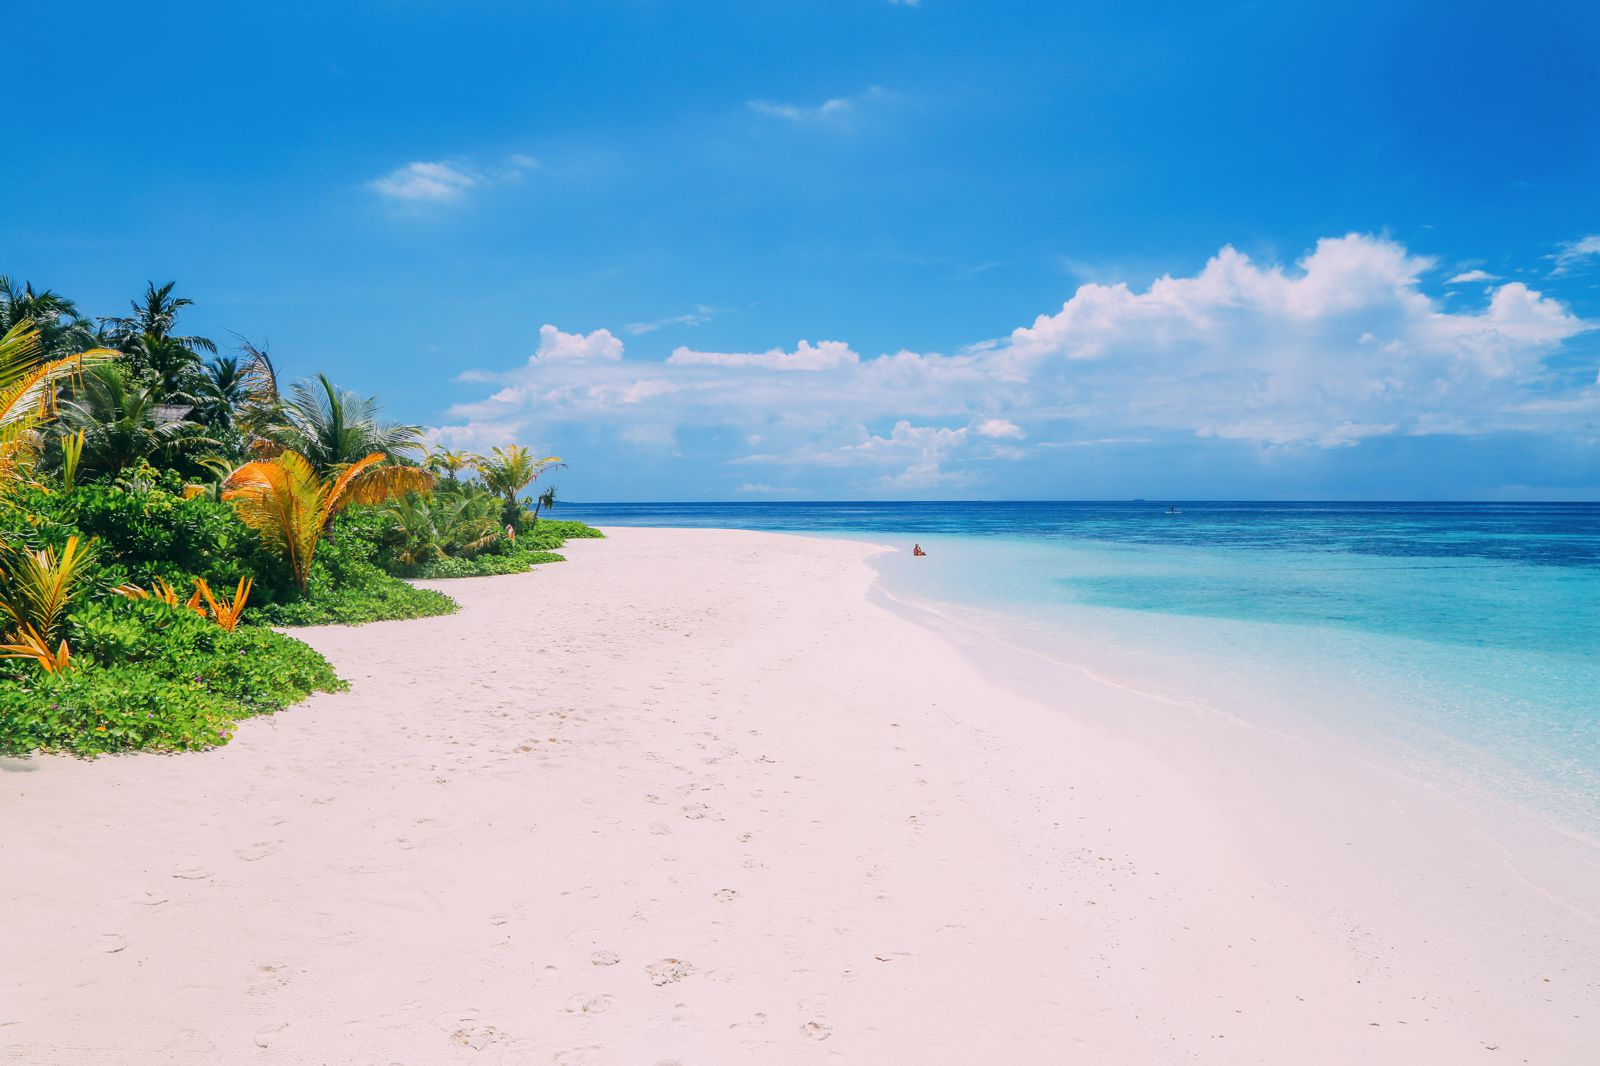 Swimming With Wild Turtles And Those Amazing Island Colours... At Kandolhu Island, Maldives (61)